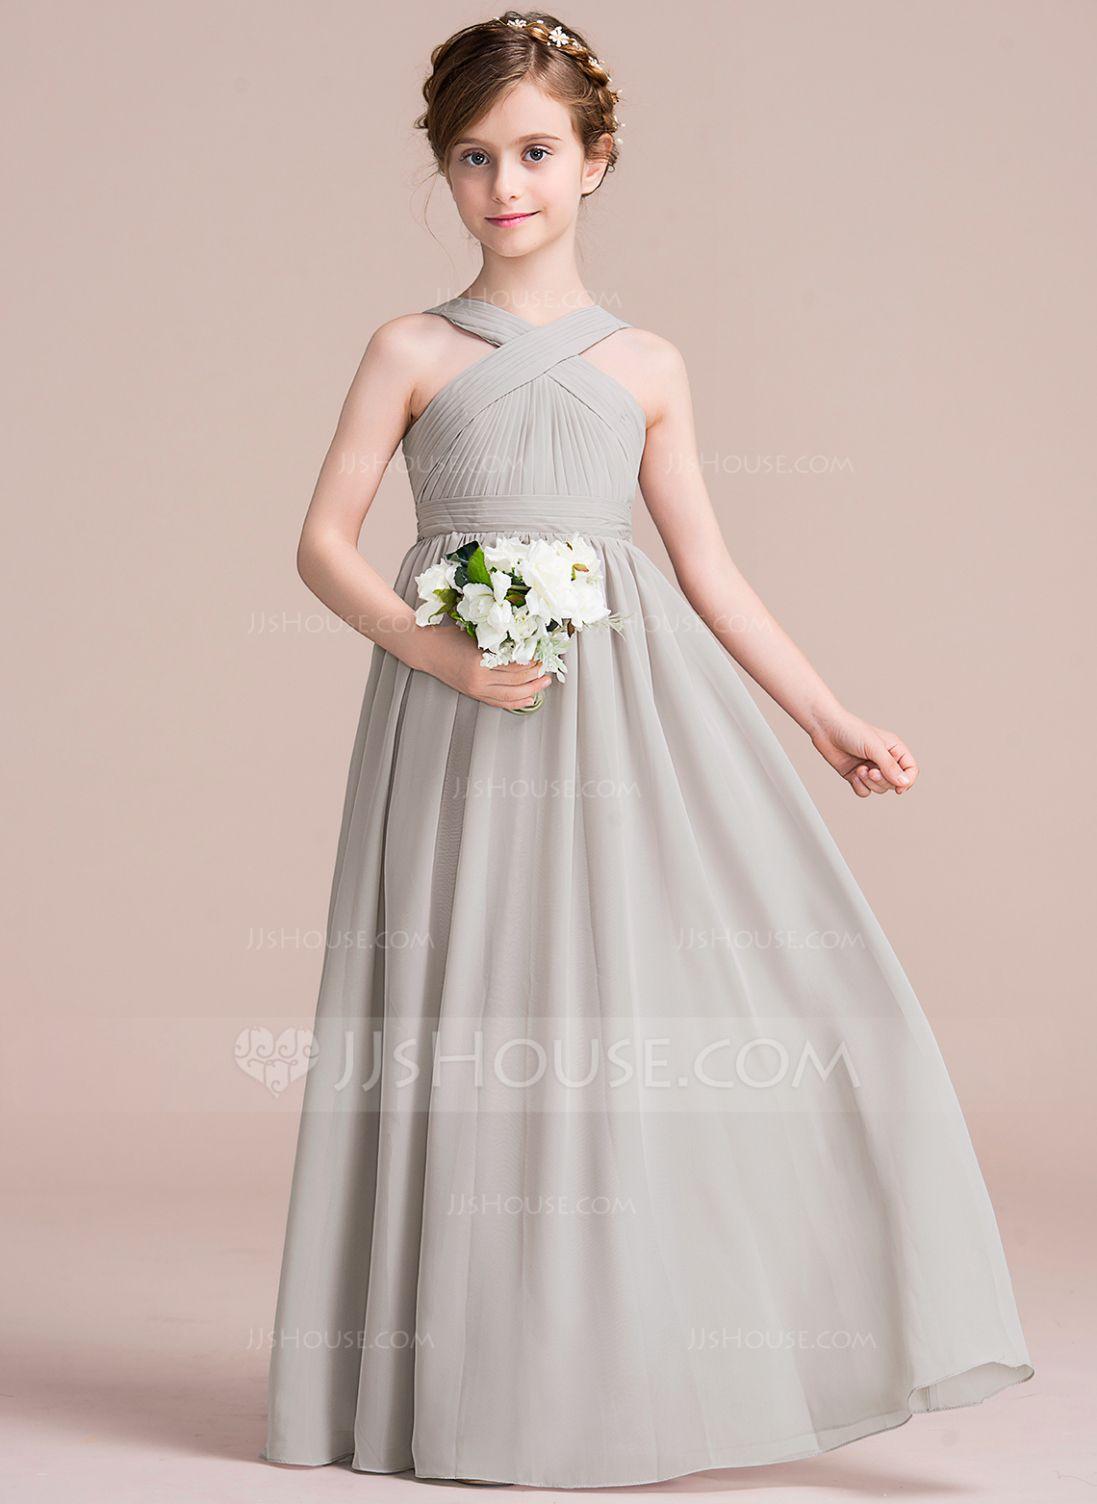 Best Of Junior Dresses for Wedding Check more at svesty